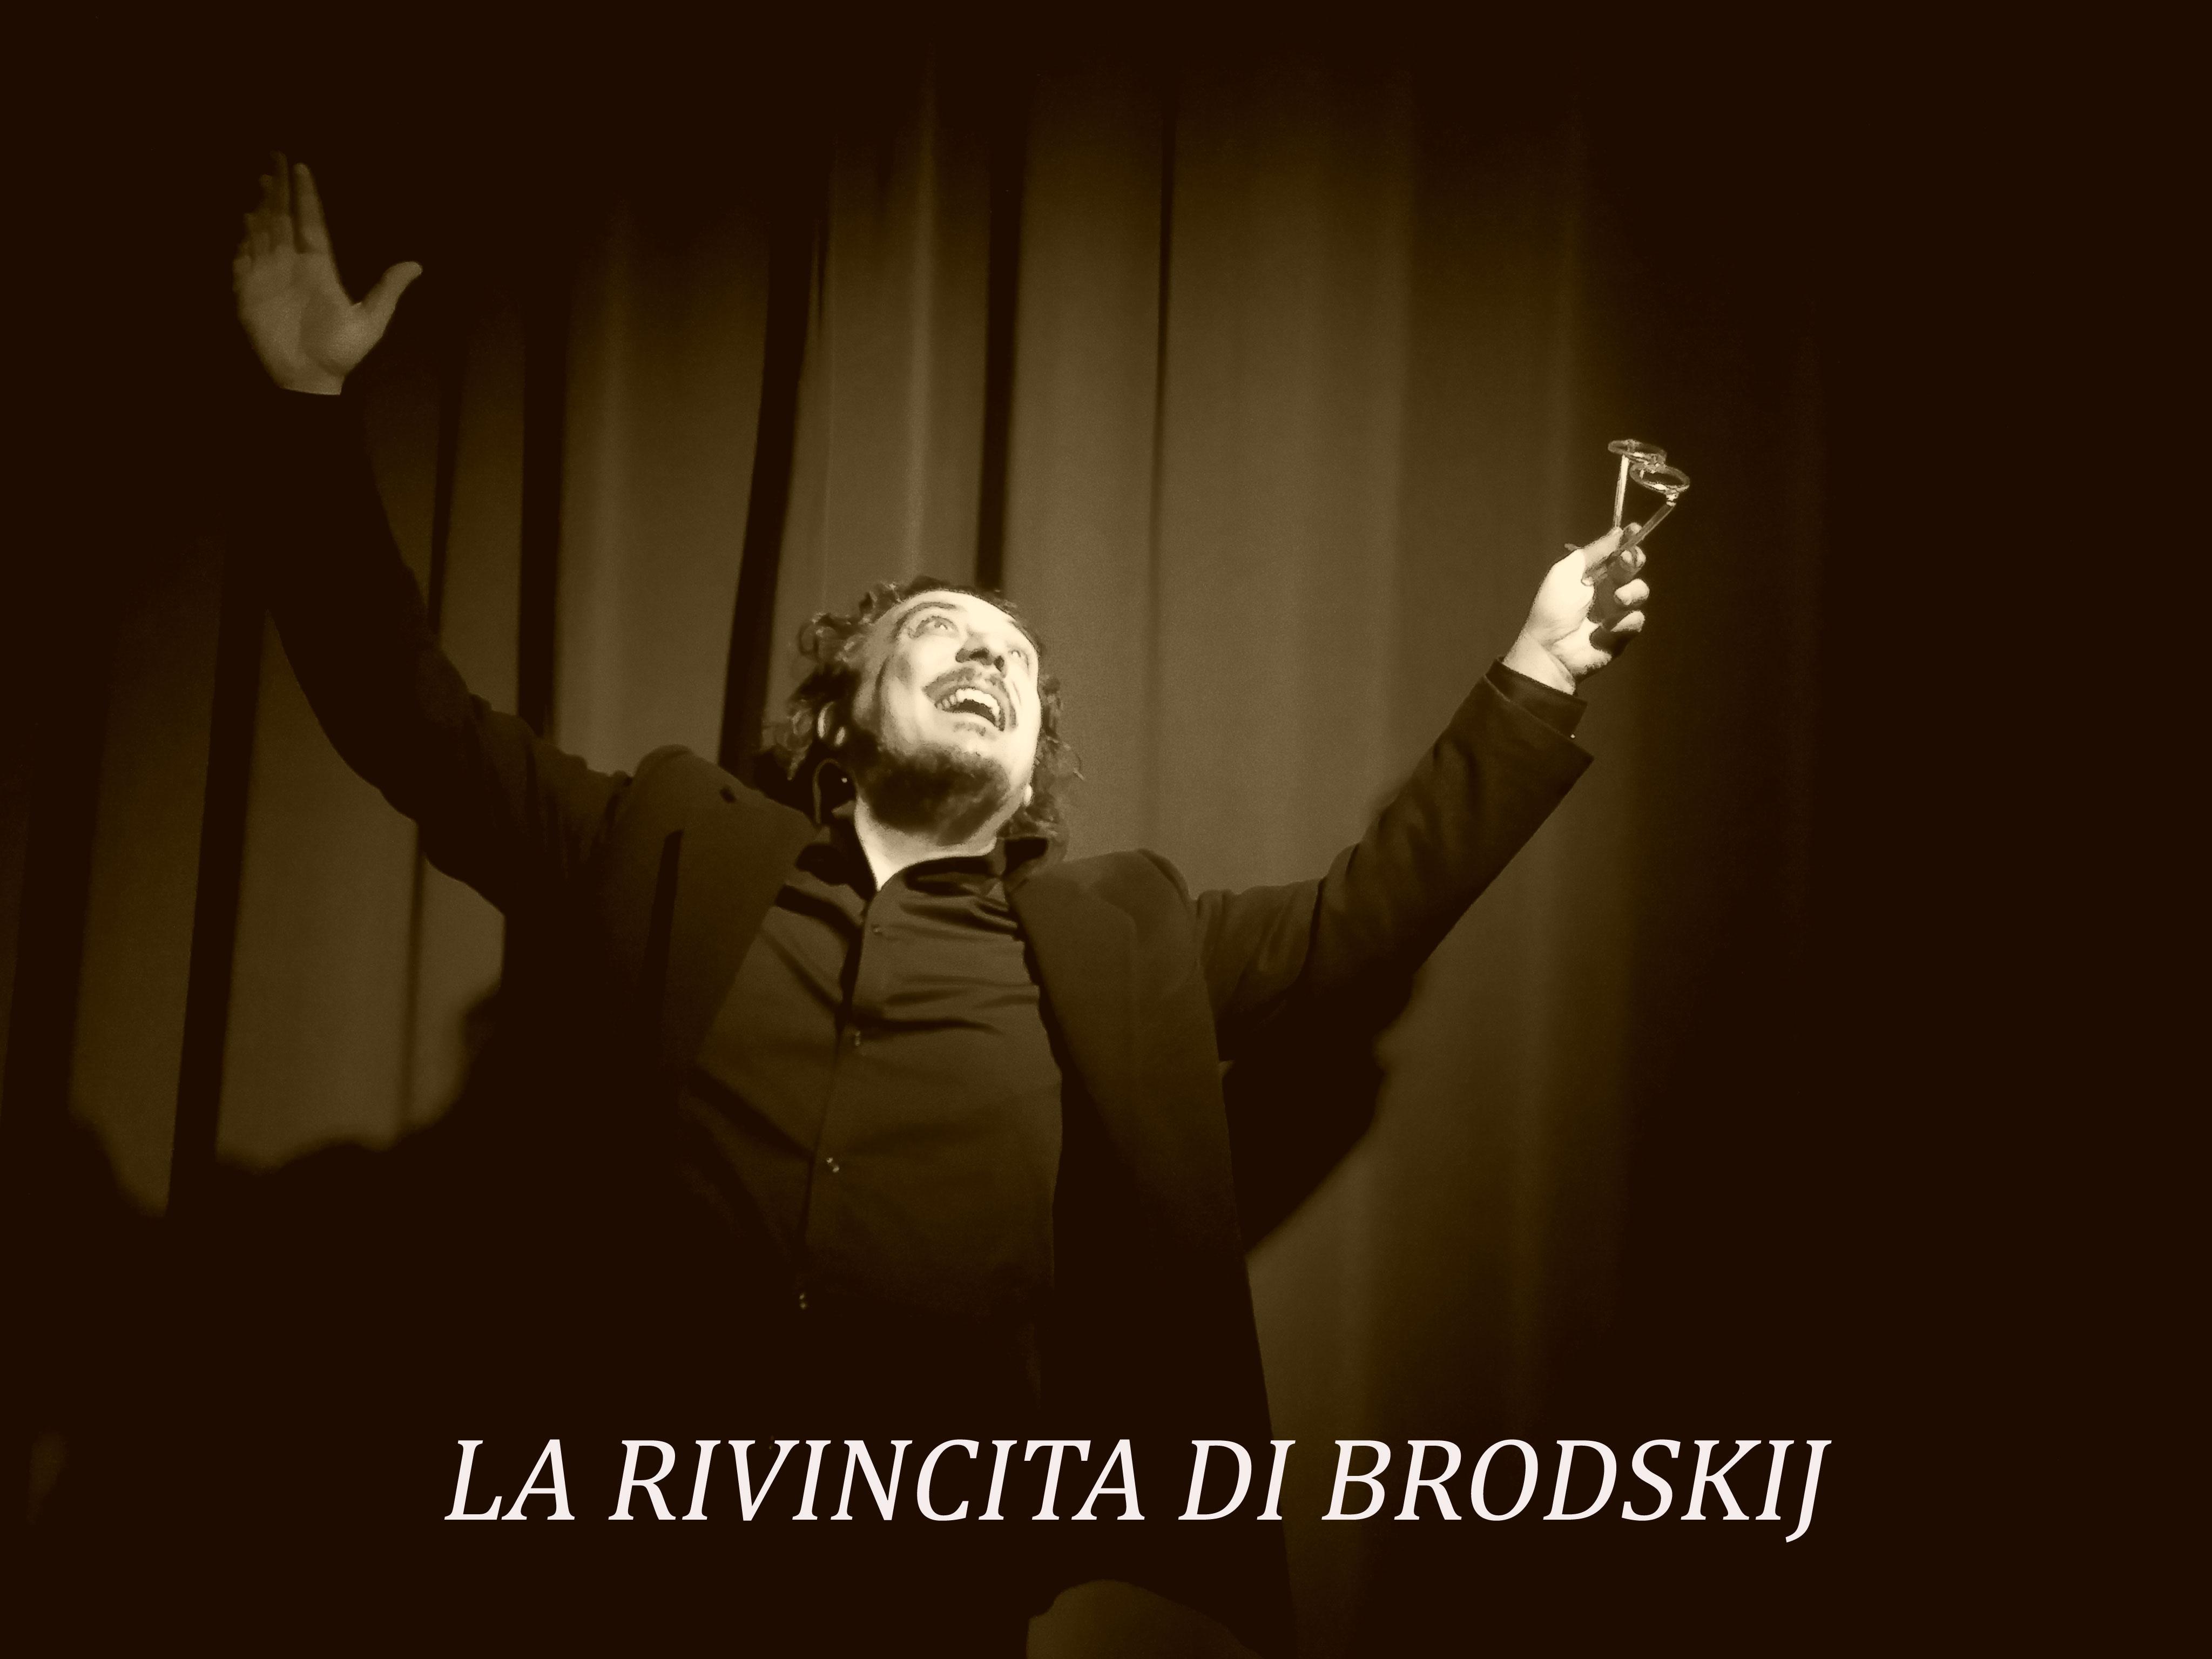 LA-RIVINCITA-DI-BROD-5